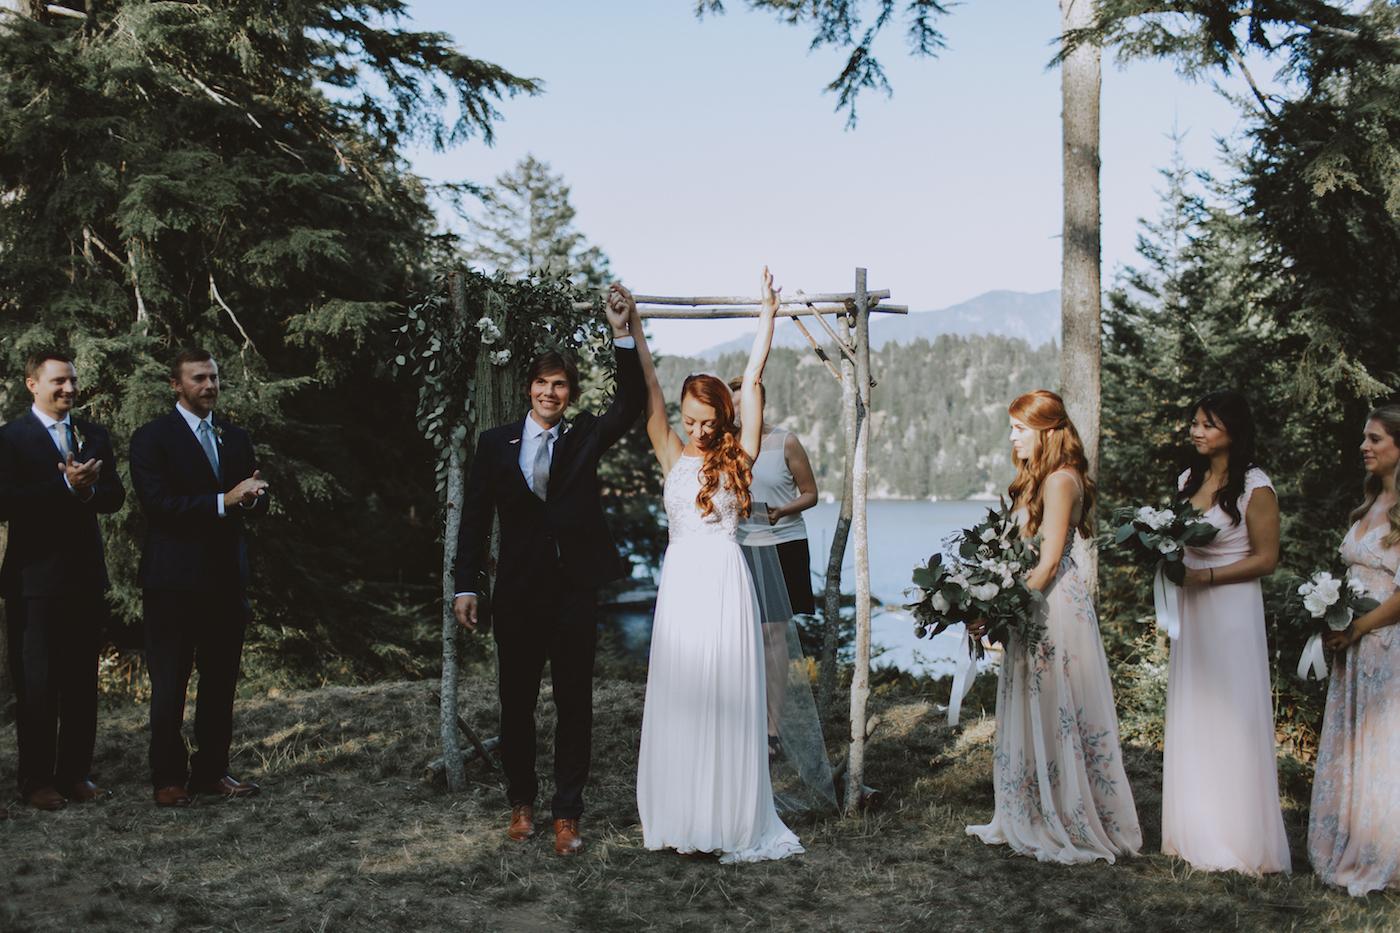 Wedding-Camp-Fircom-Gambier-Island-15.jpg